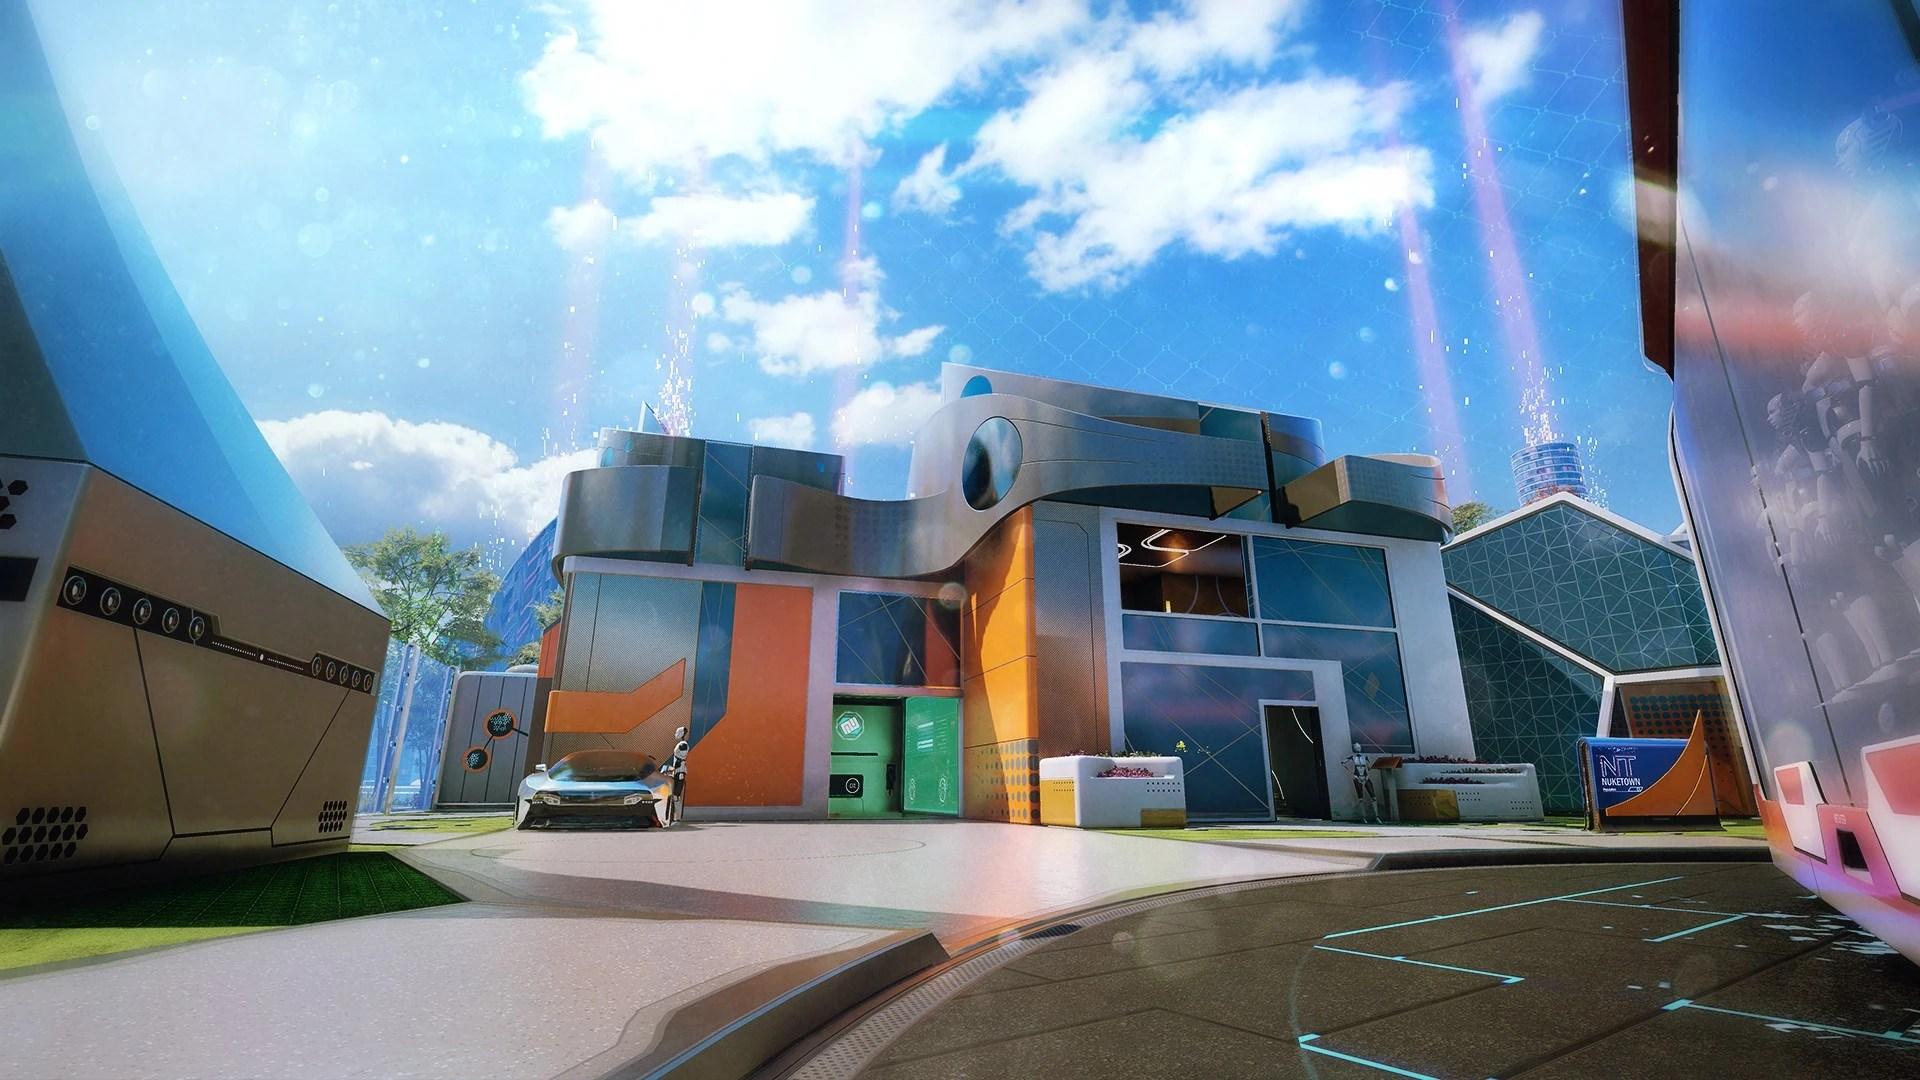 Titan Fall 2 Hd Wallpaper Nuk3town Call Of Duty Wiki Fandom Powered By Wikia